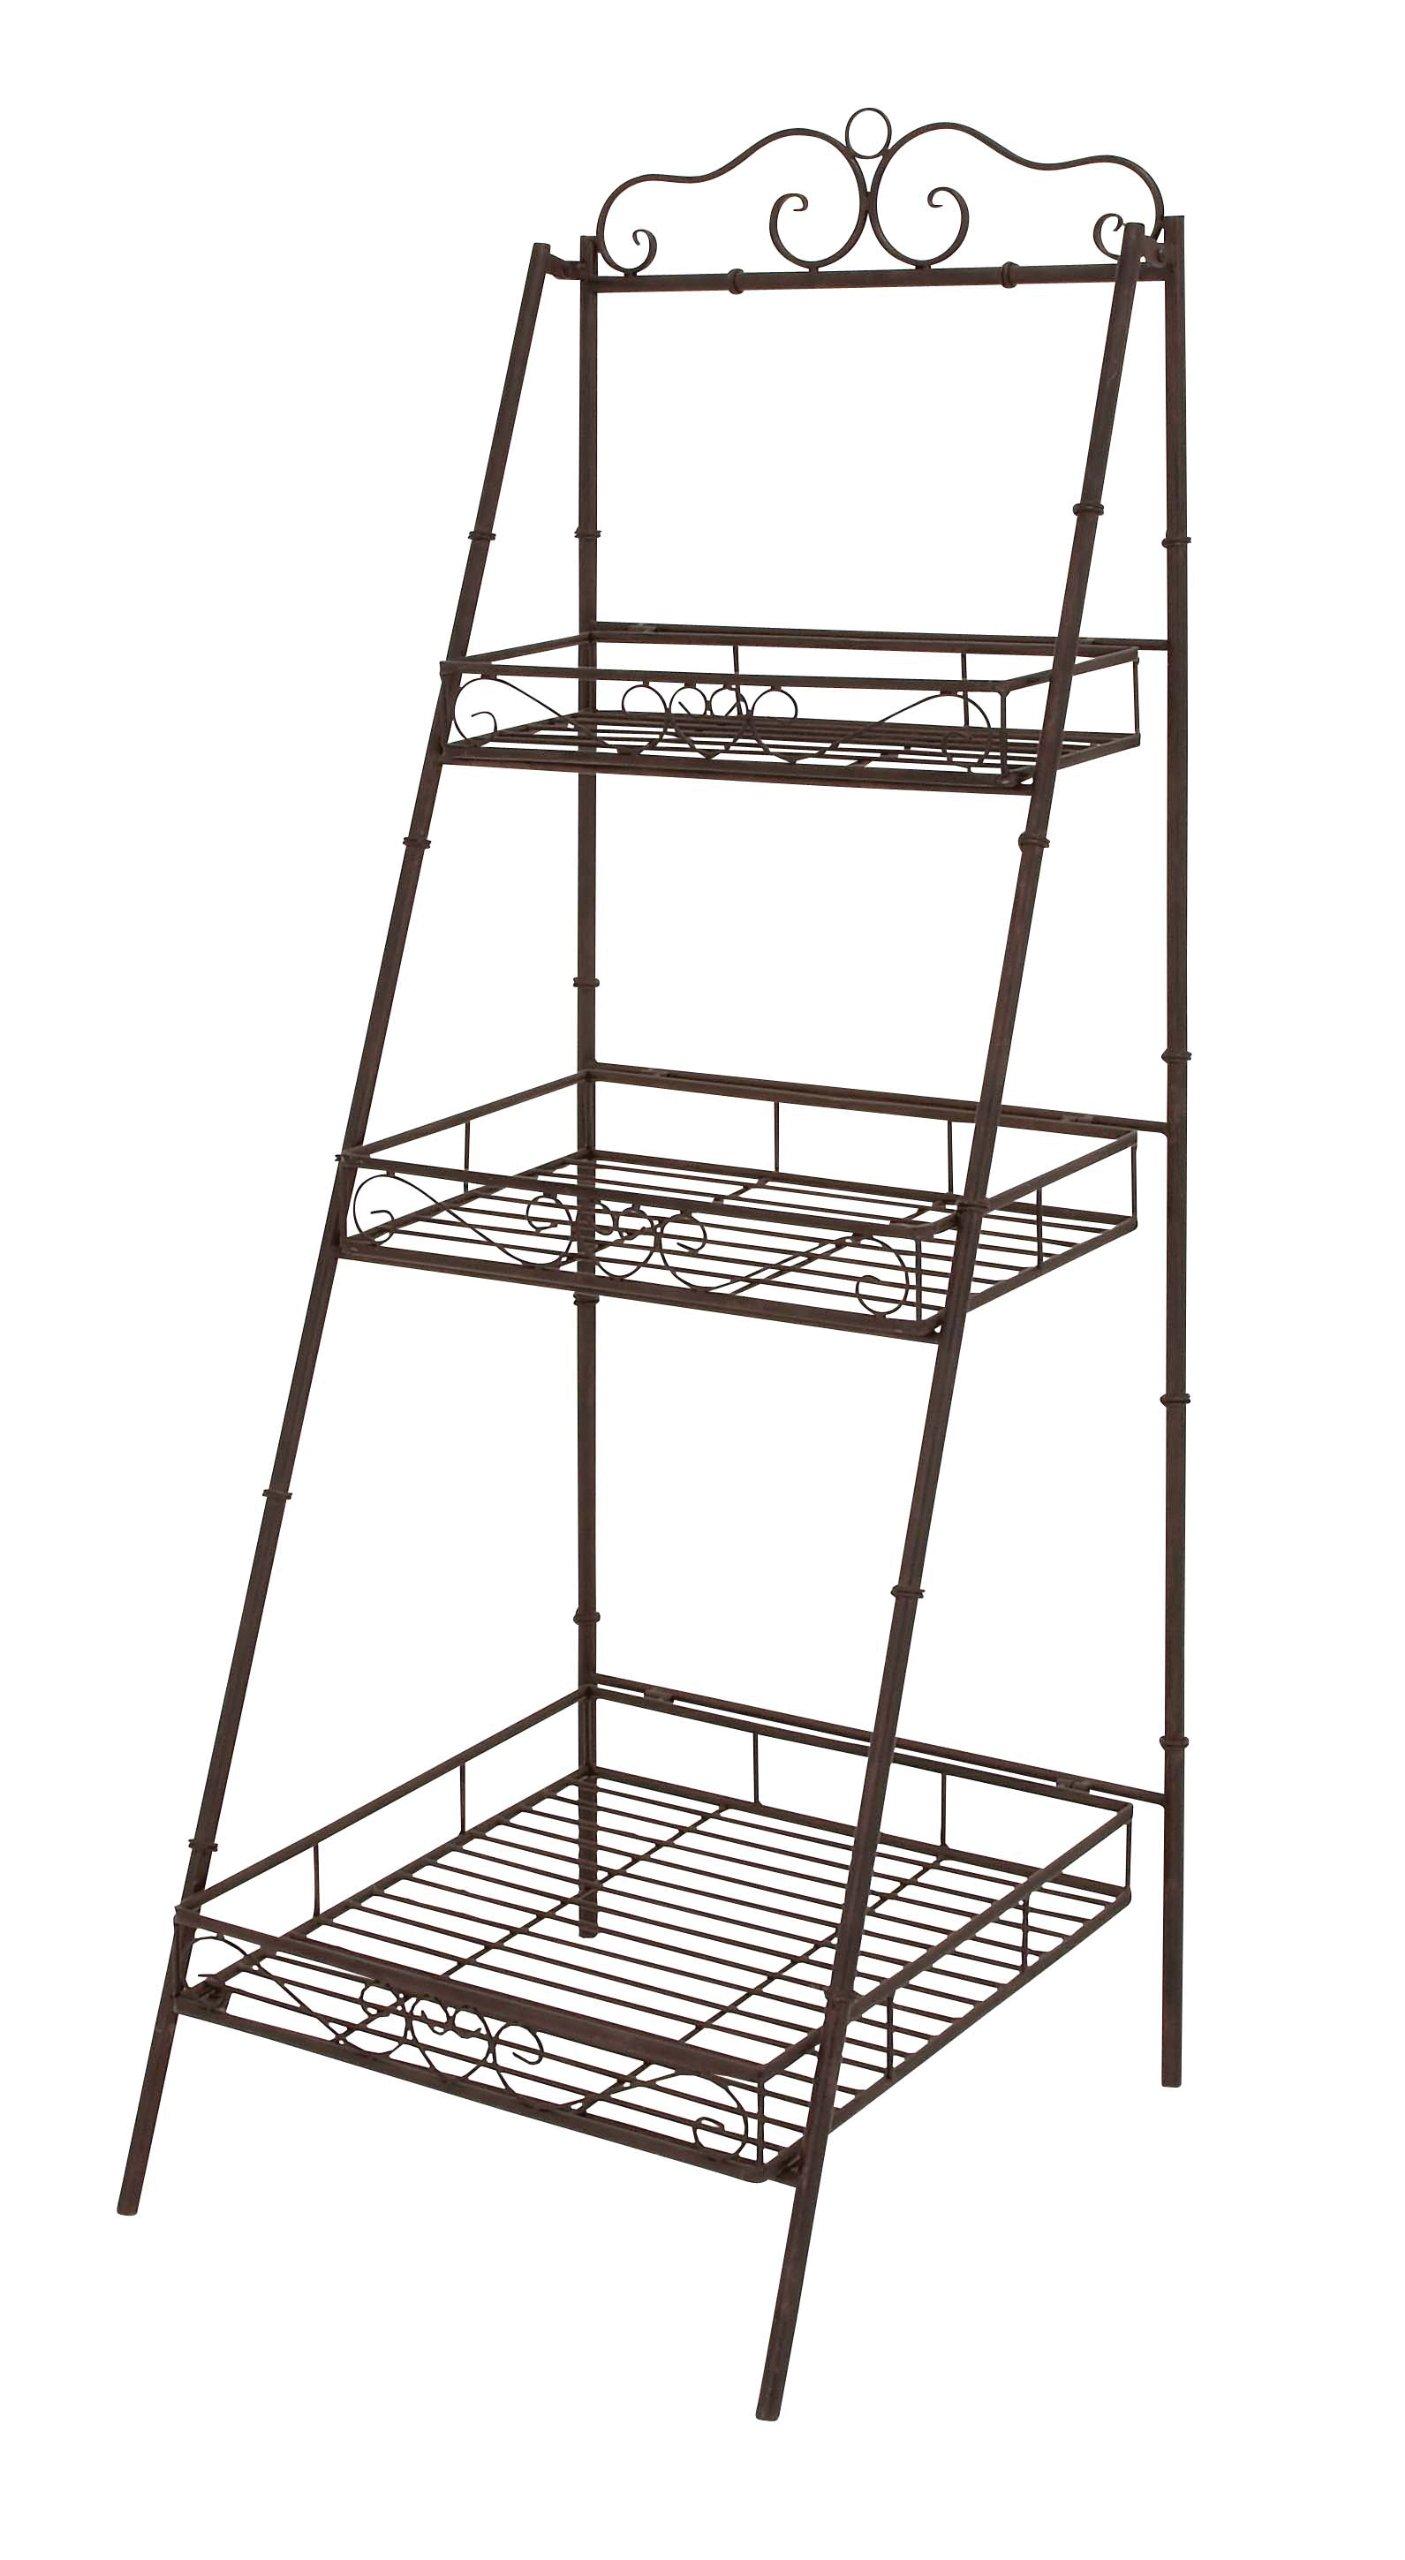 Deco 79 Metal 3 Tier Shelf, 21-Inch by 59-Inch, Set of 2